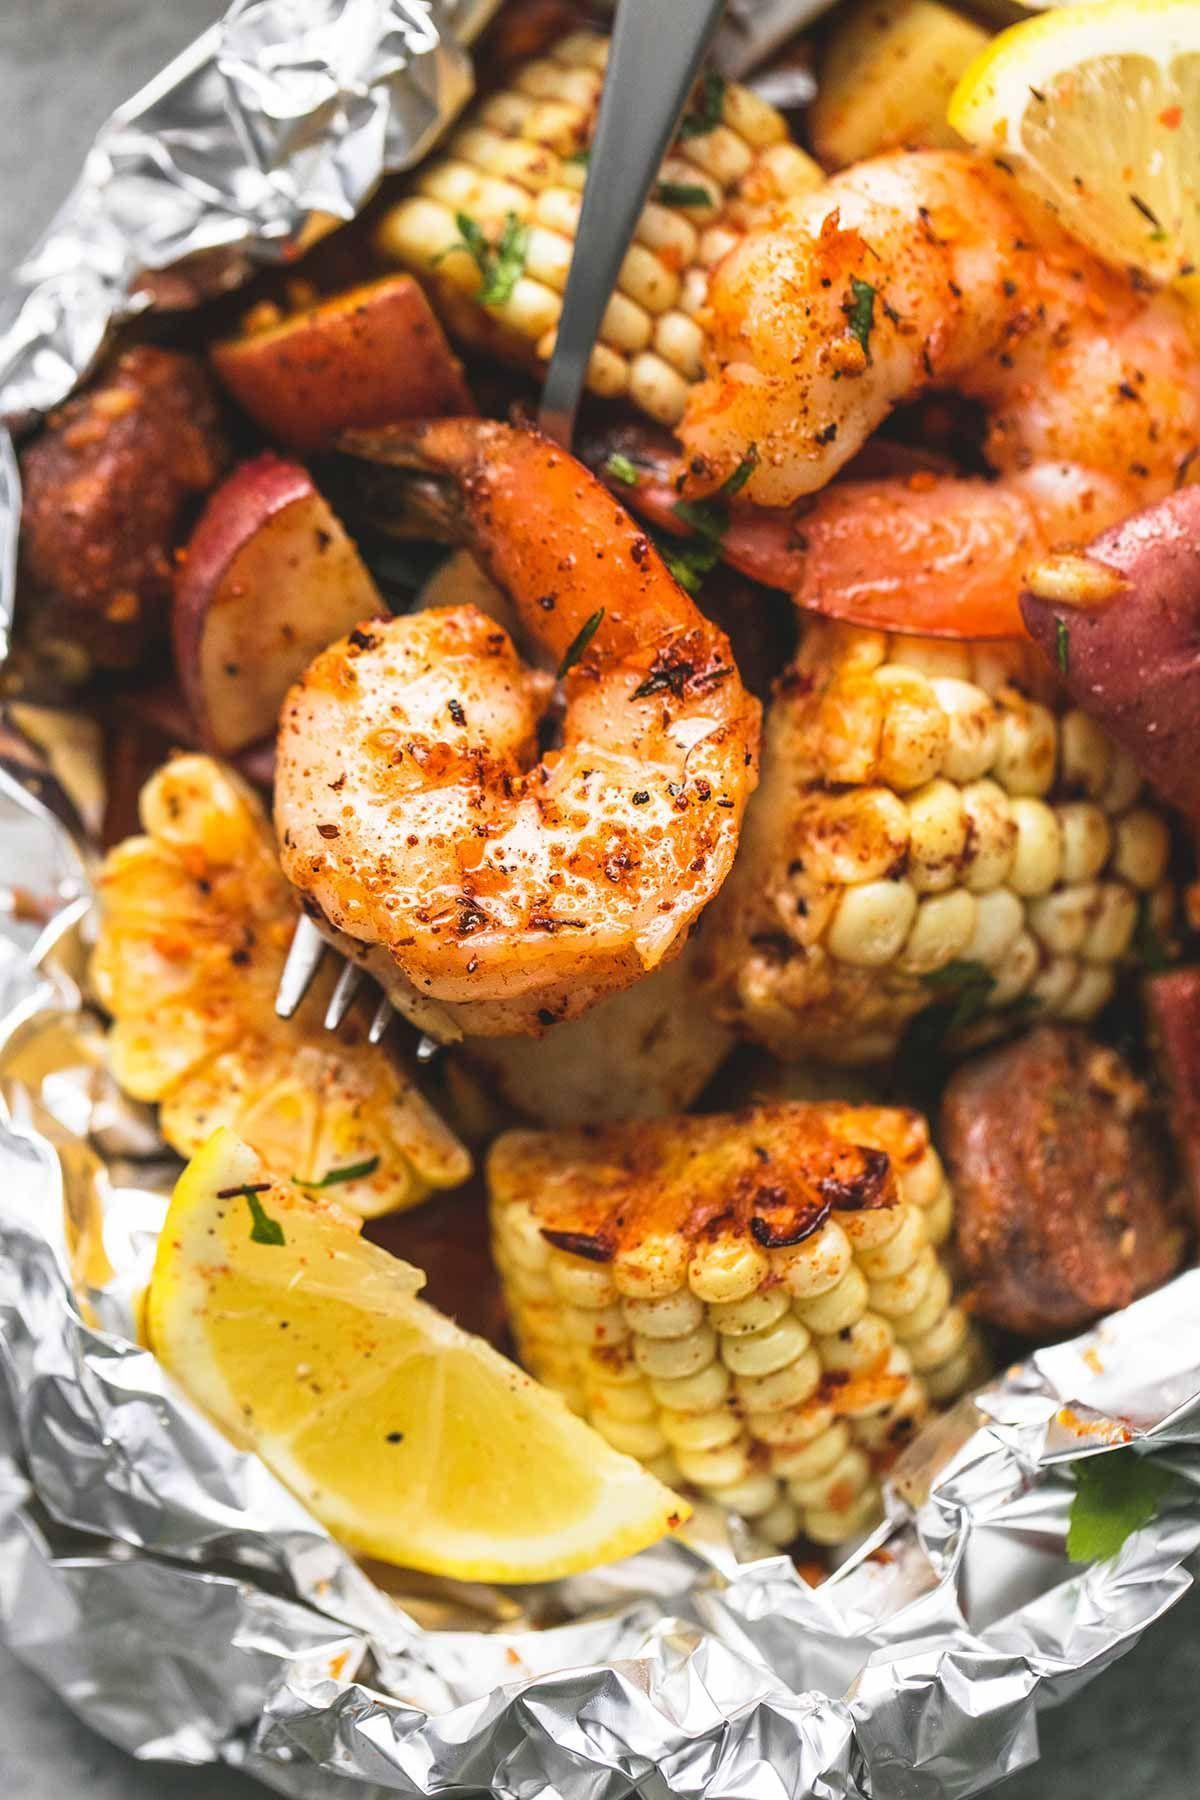 Easy tasty shrimp boil dinners baked or grilled in foil